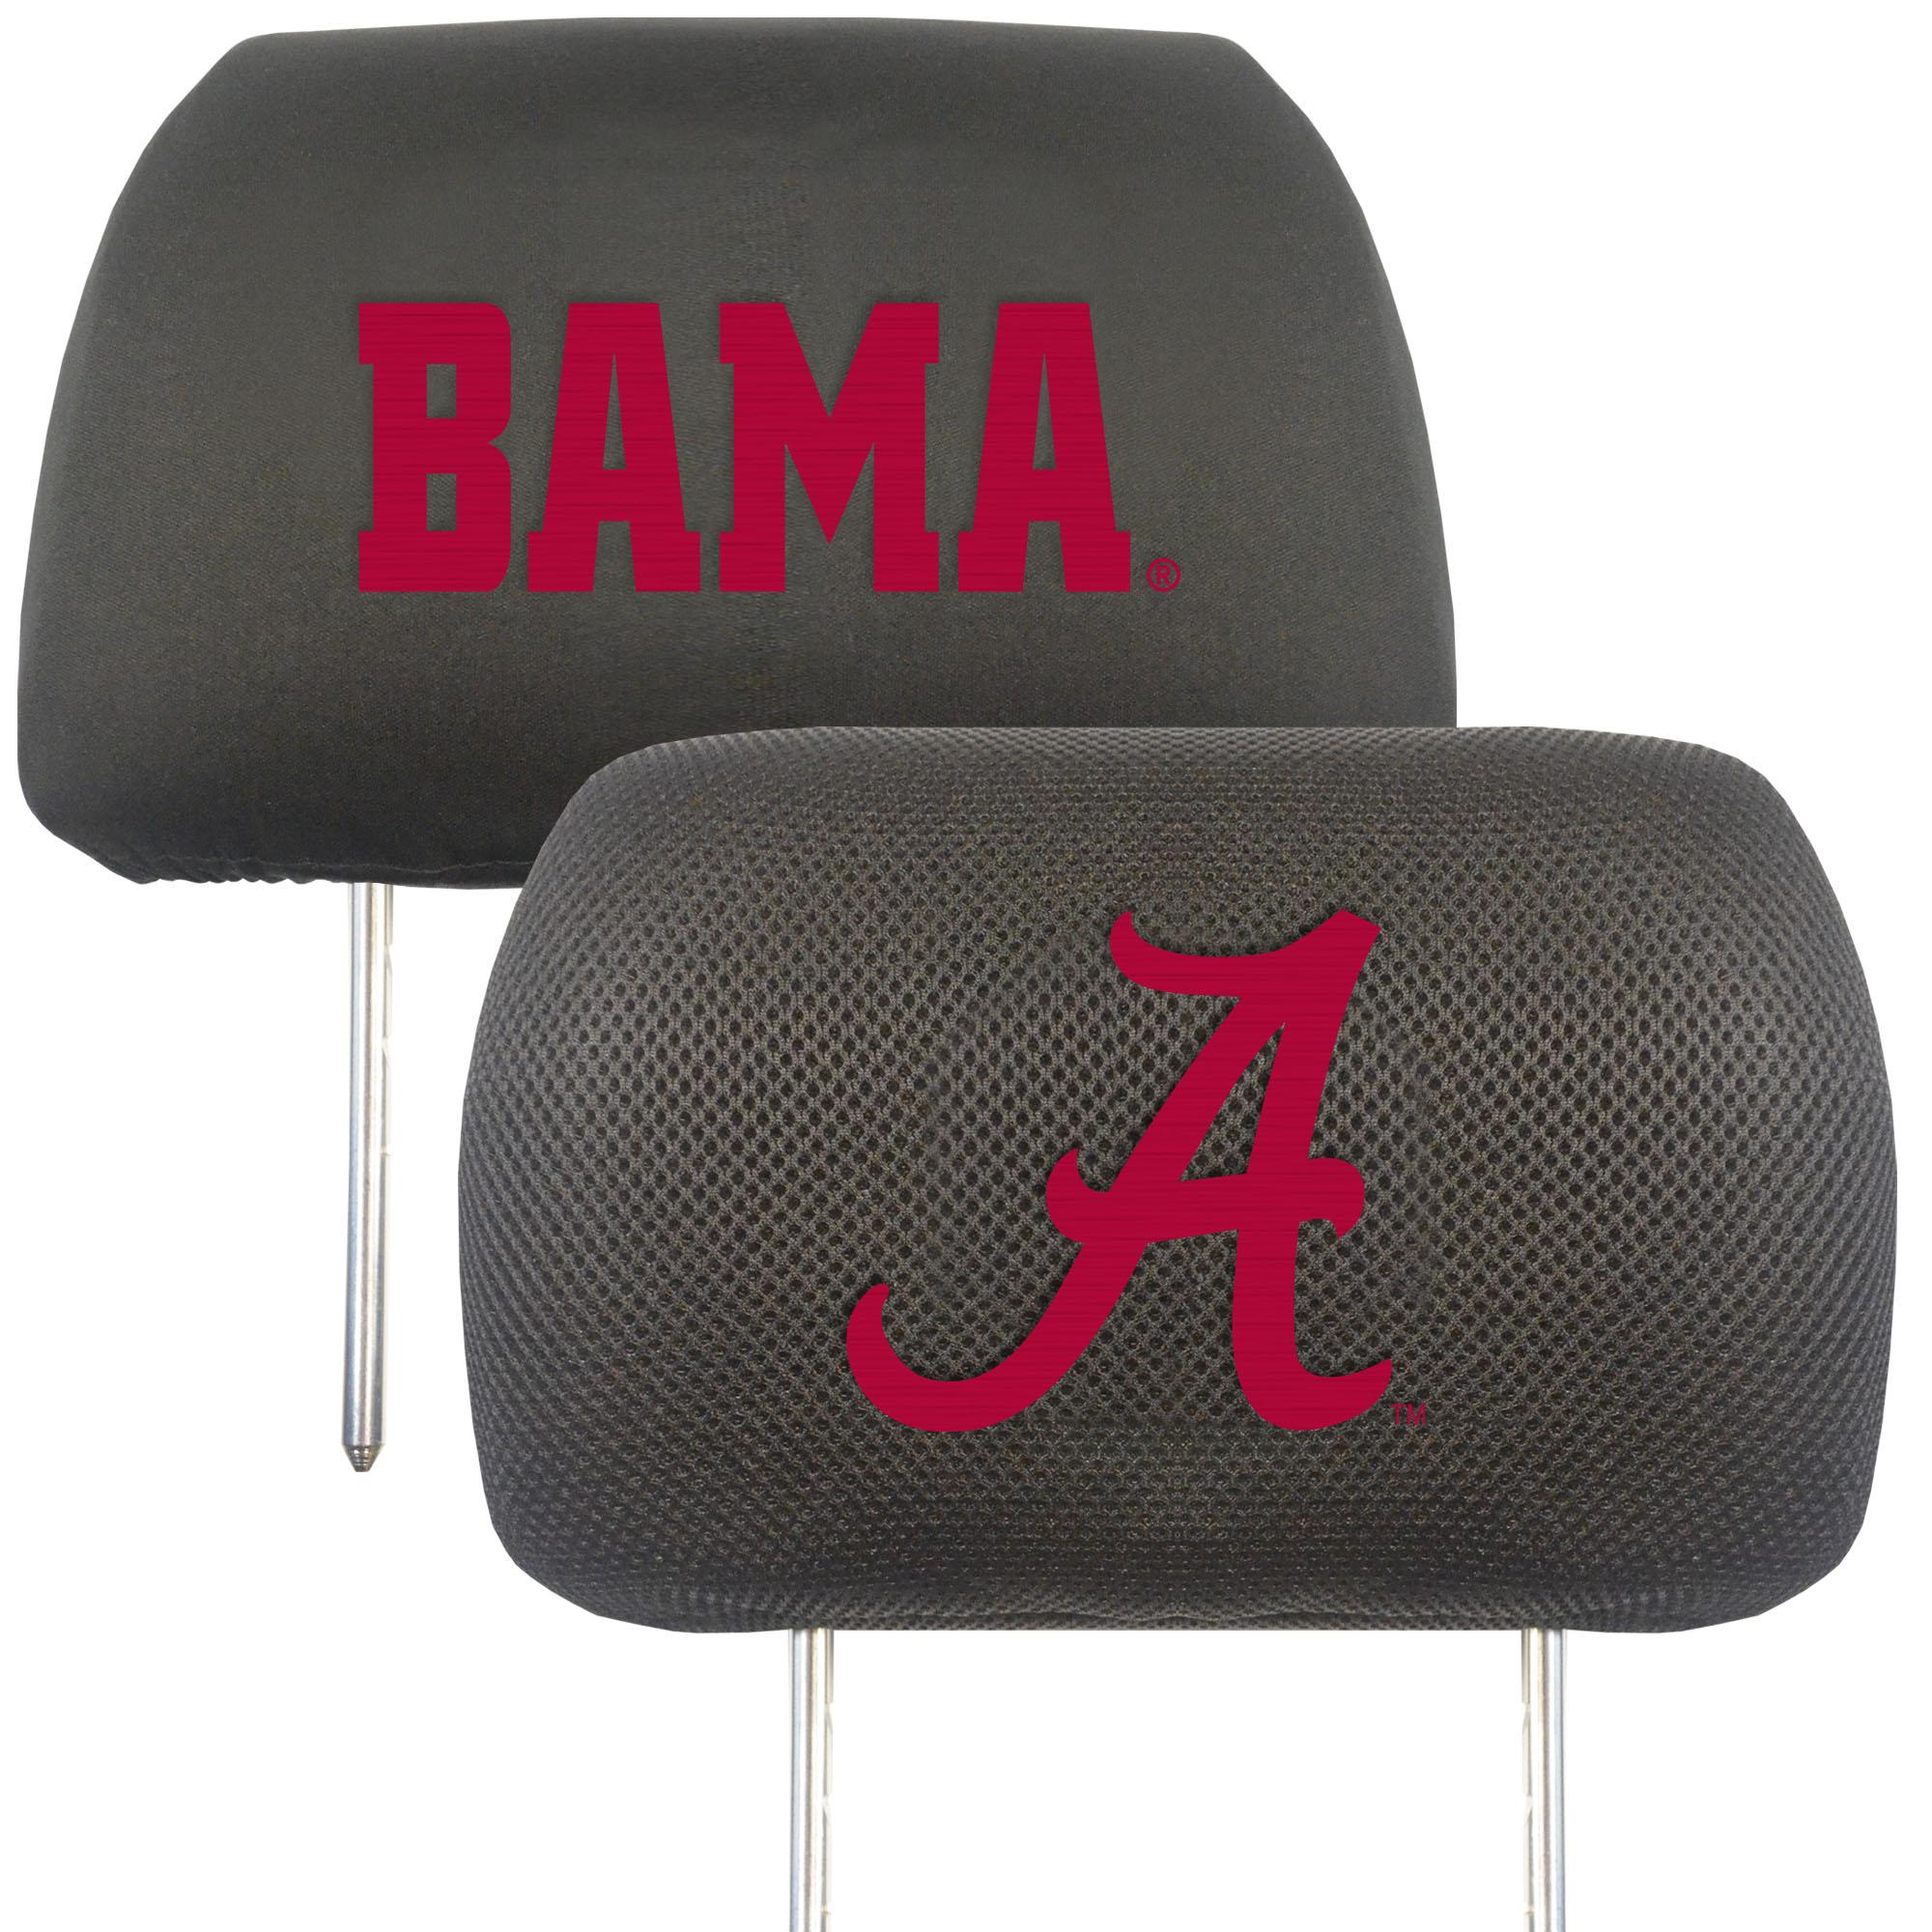 NCAA University of Alabama Crimson Tide Head Rest Cover Automotive Accessory